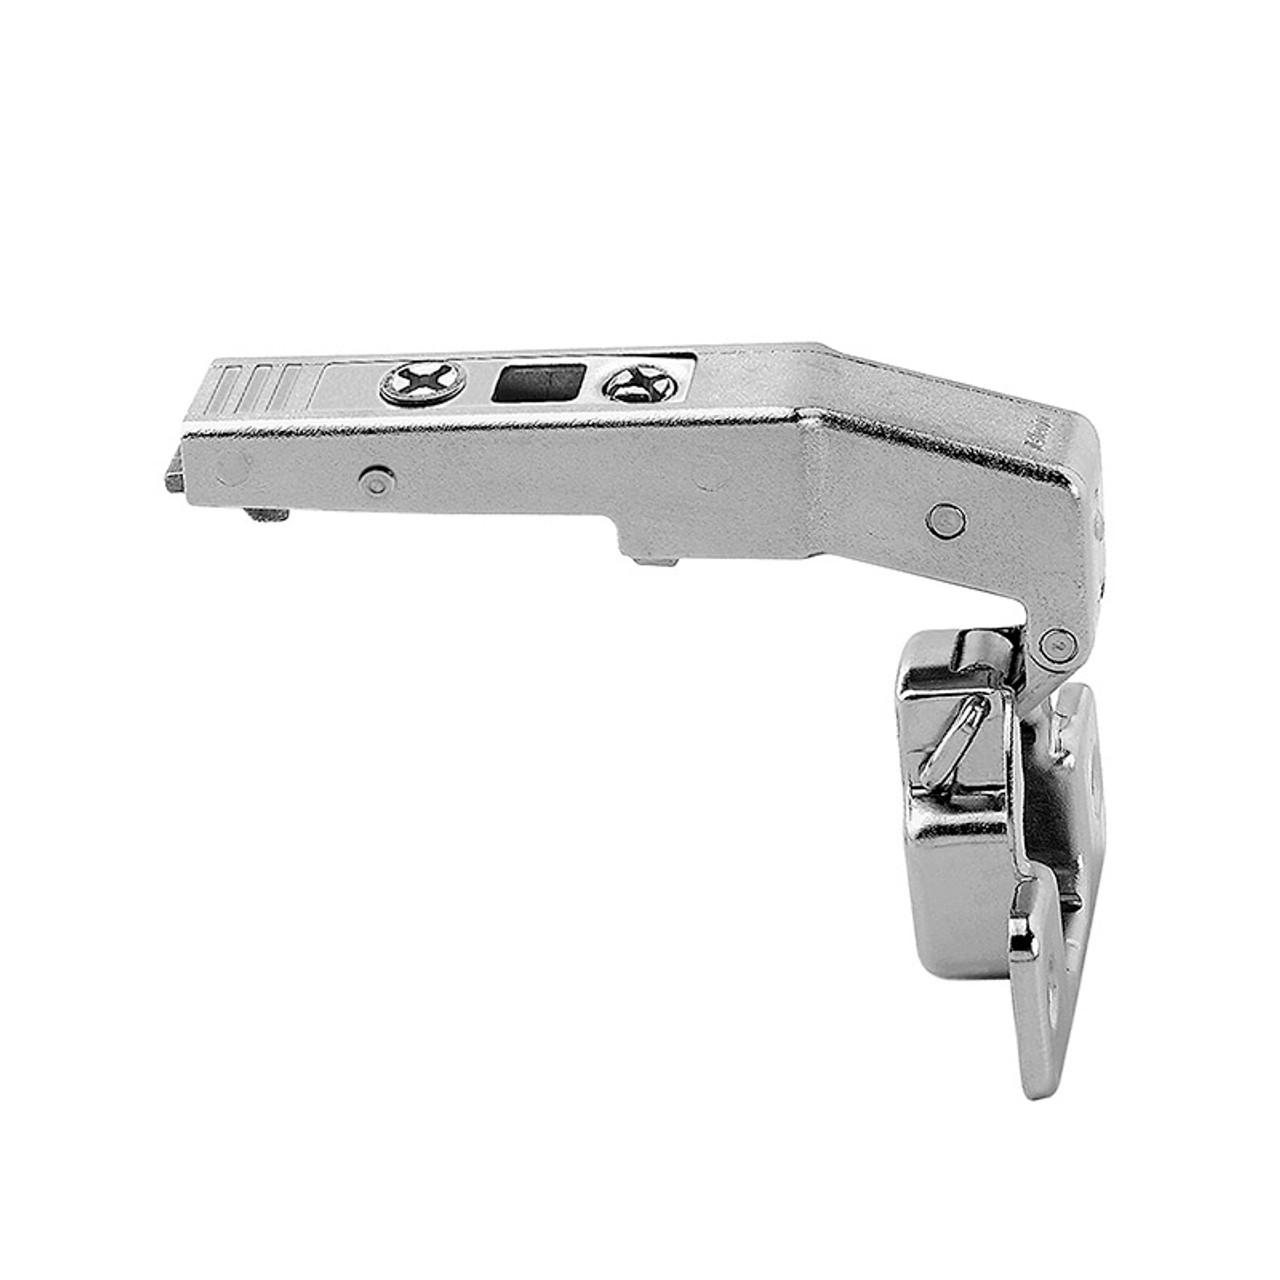 CLIP top Blind Corner Screw-on Hinge - Inset